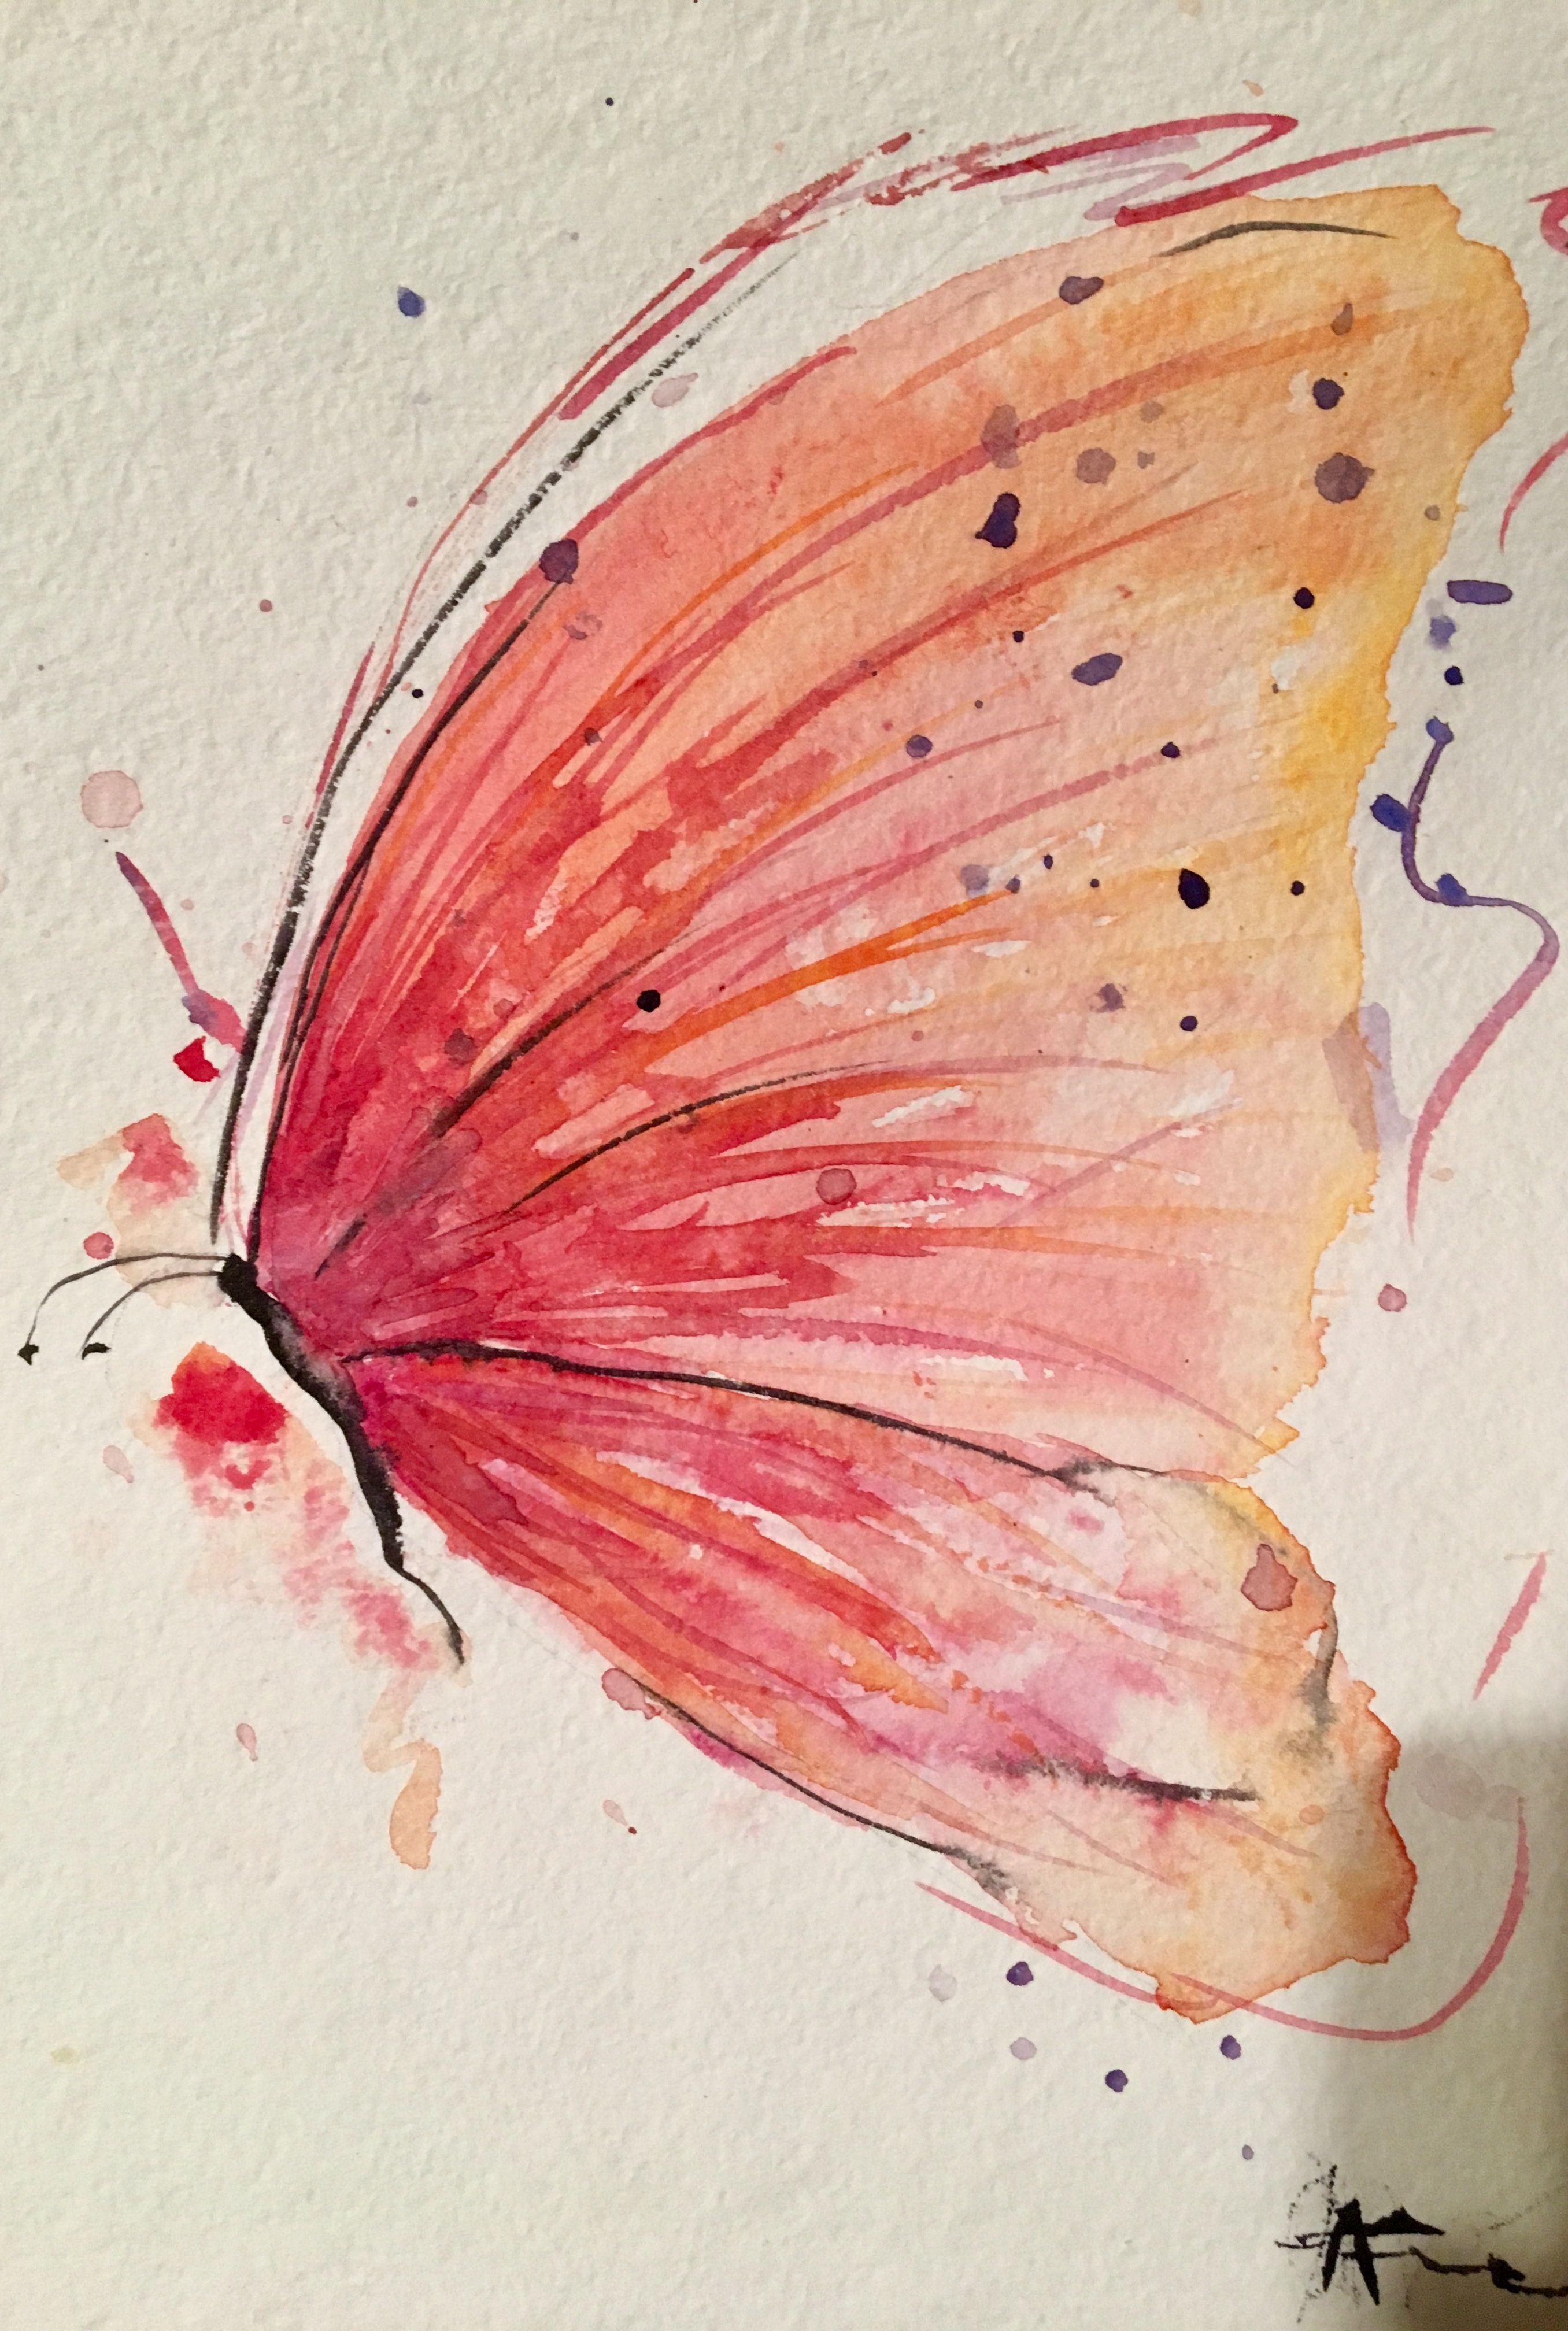 Watercolor Mariposa Butterfly Watercolor Watercolor Art Watercolor Paintings For Beginners